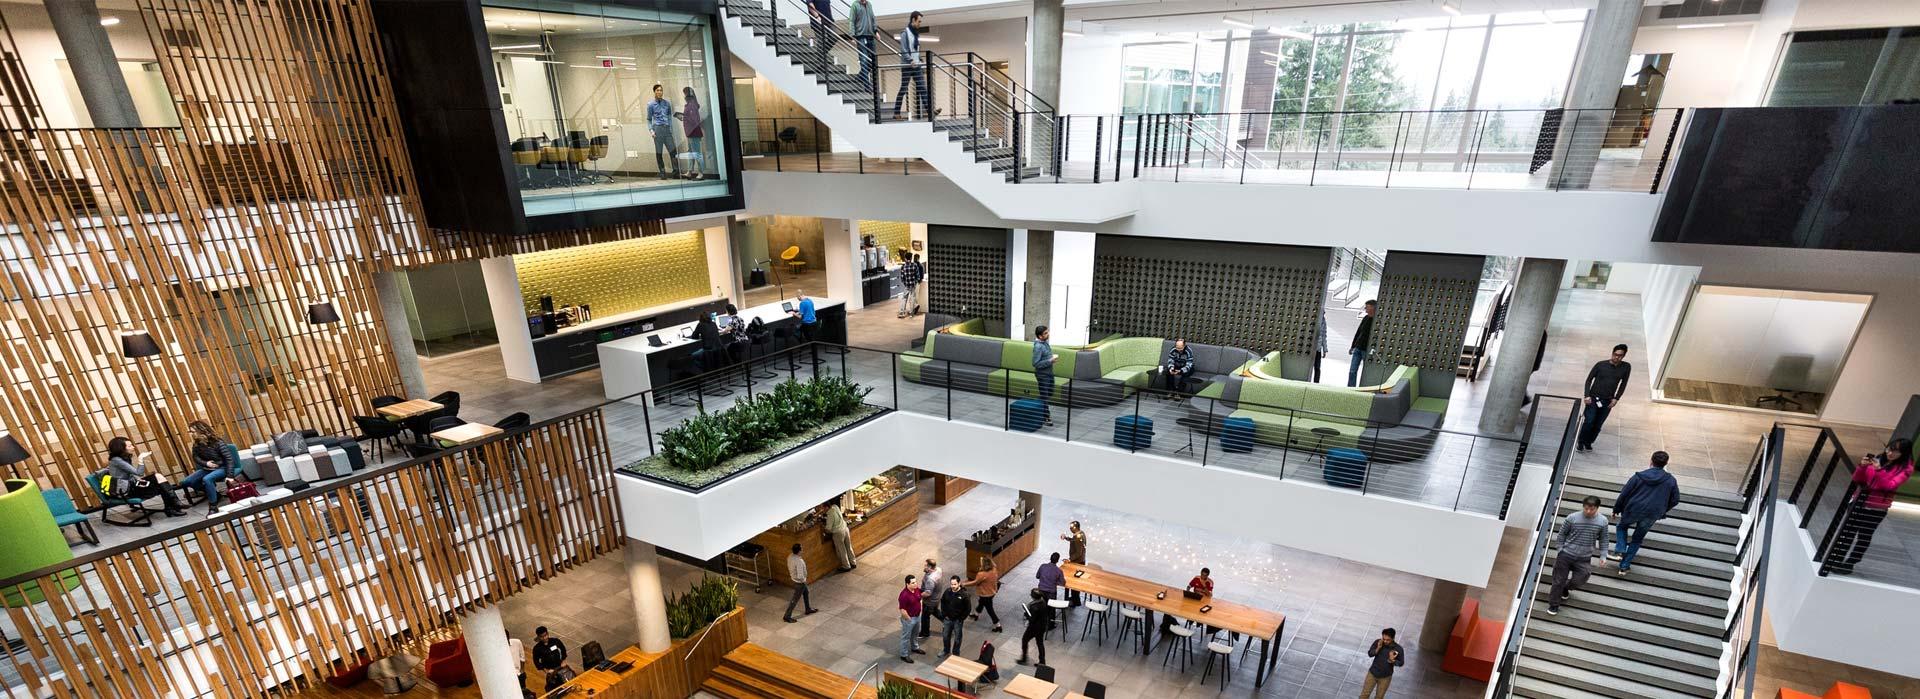 Microsoft Building 83, Redmond, WA